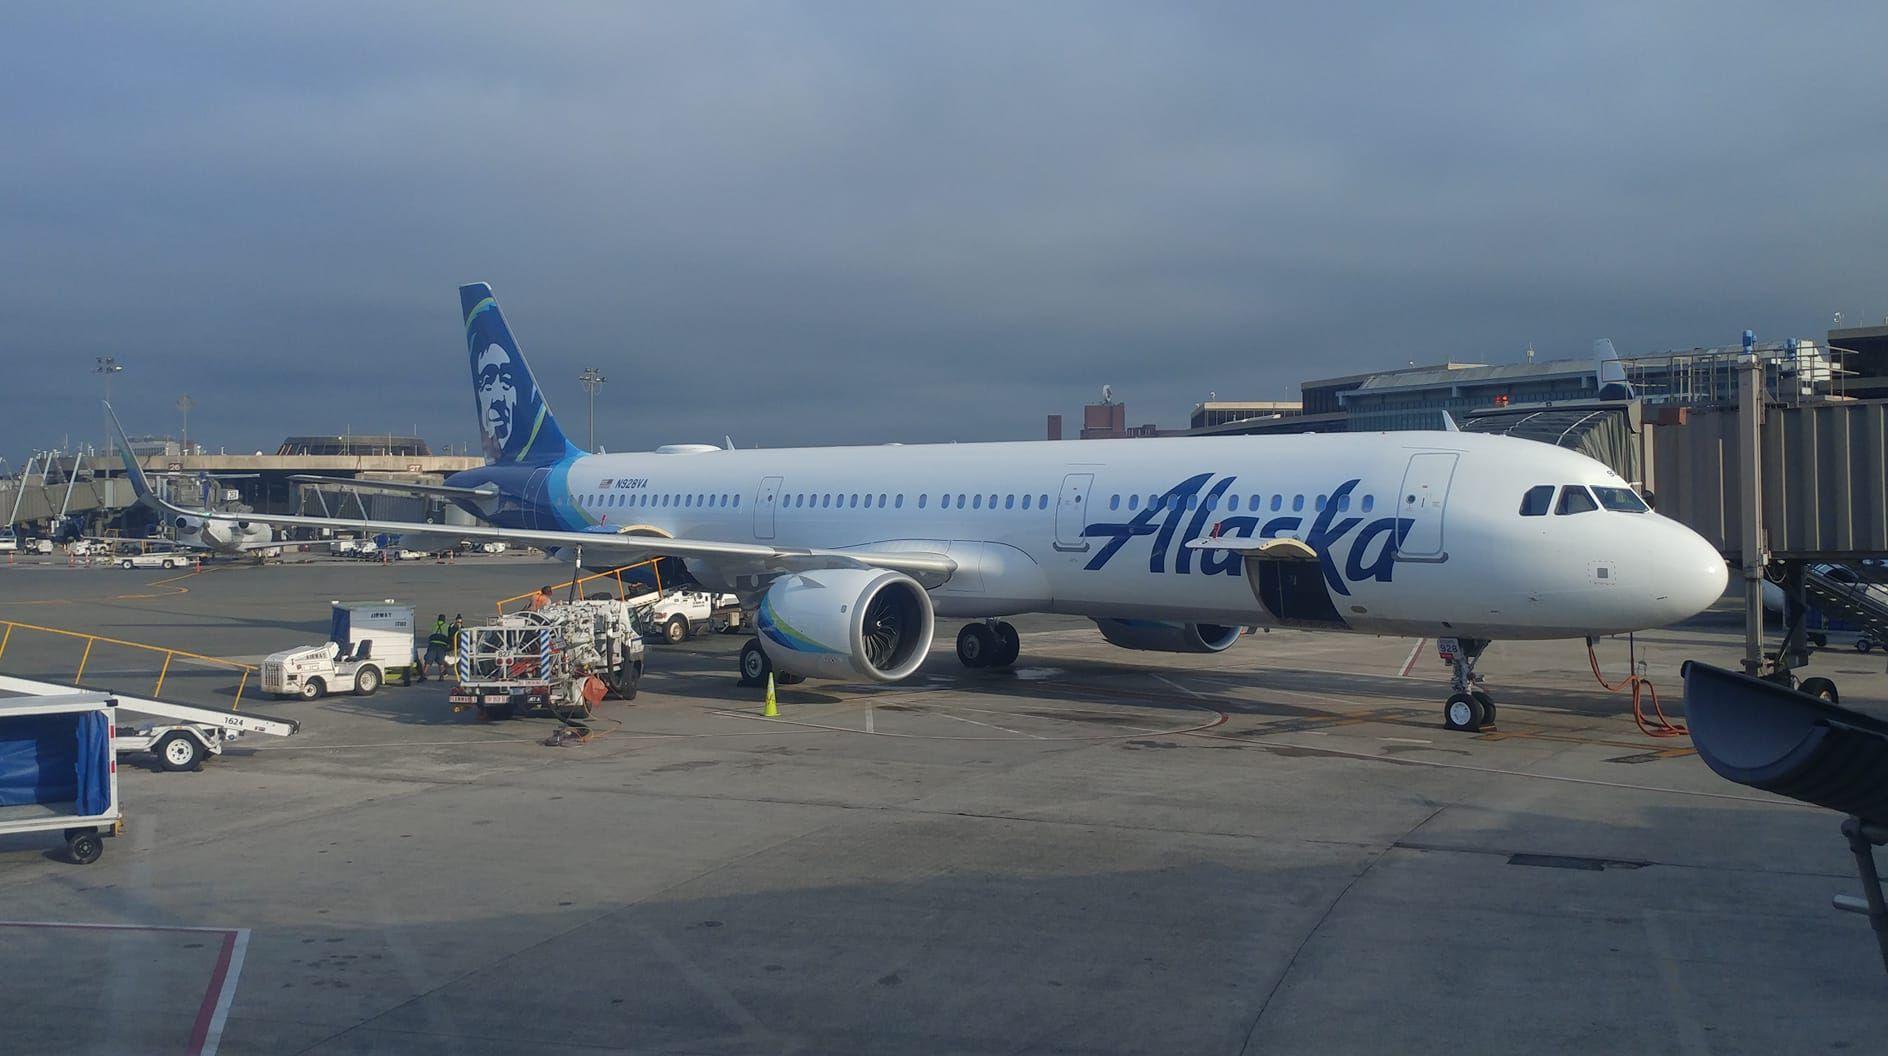 Alaska Airlines / Ted Stevens Airport